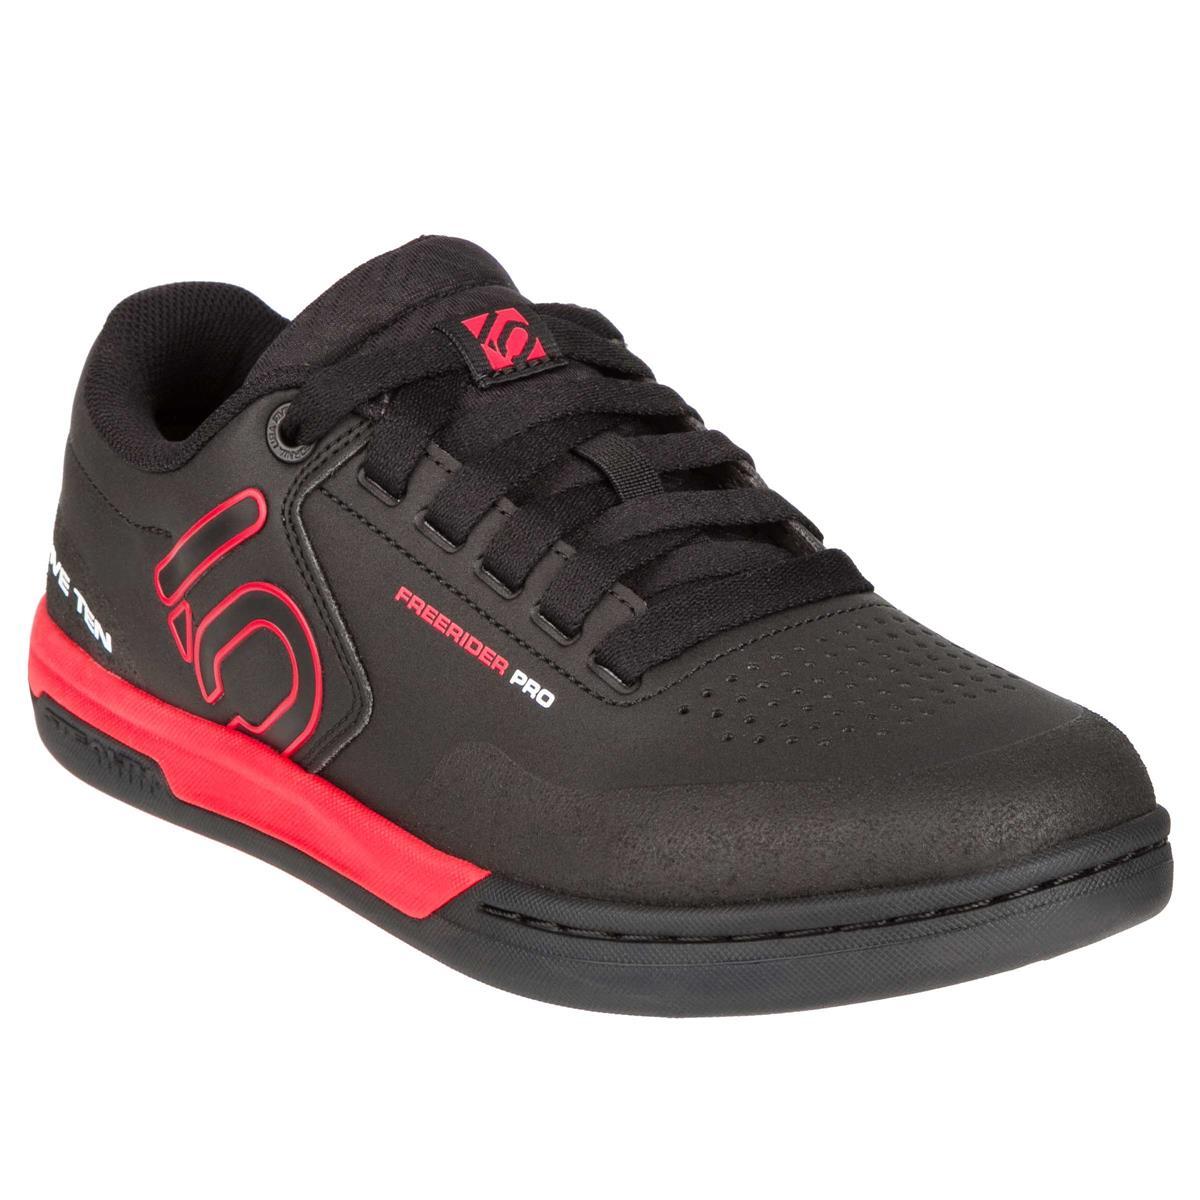 2a6163a79b7 Five Ten Bike Shoes Freerider Pro Core Black/Red/ftwr White | Maciag ...